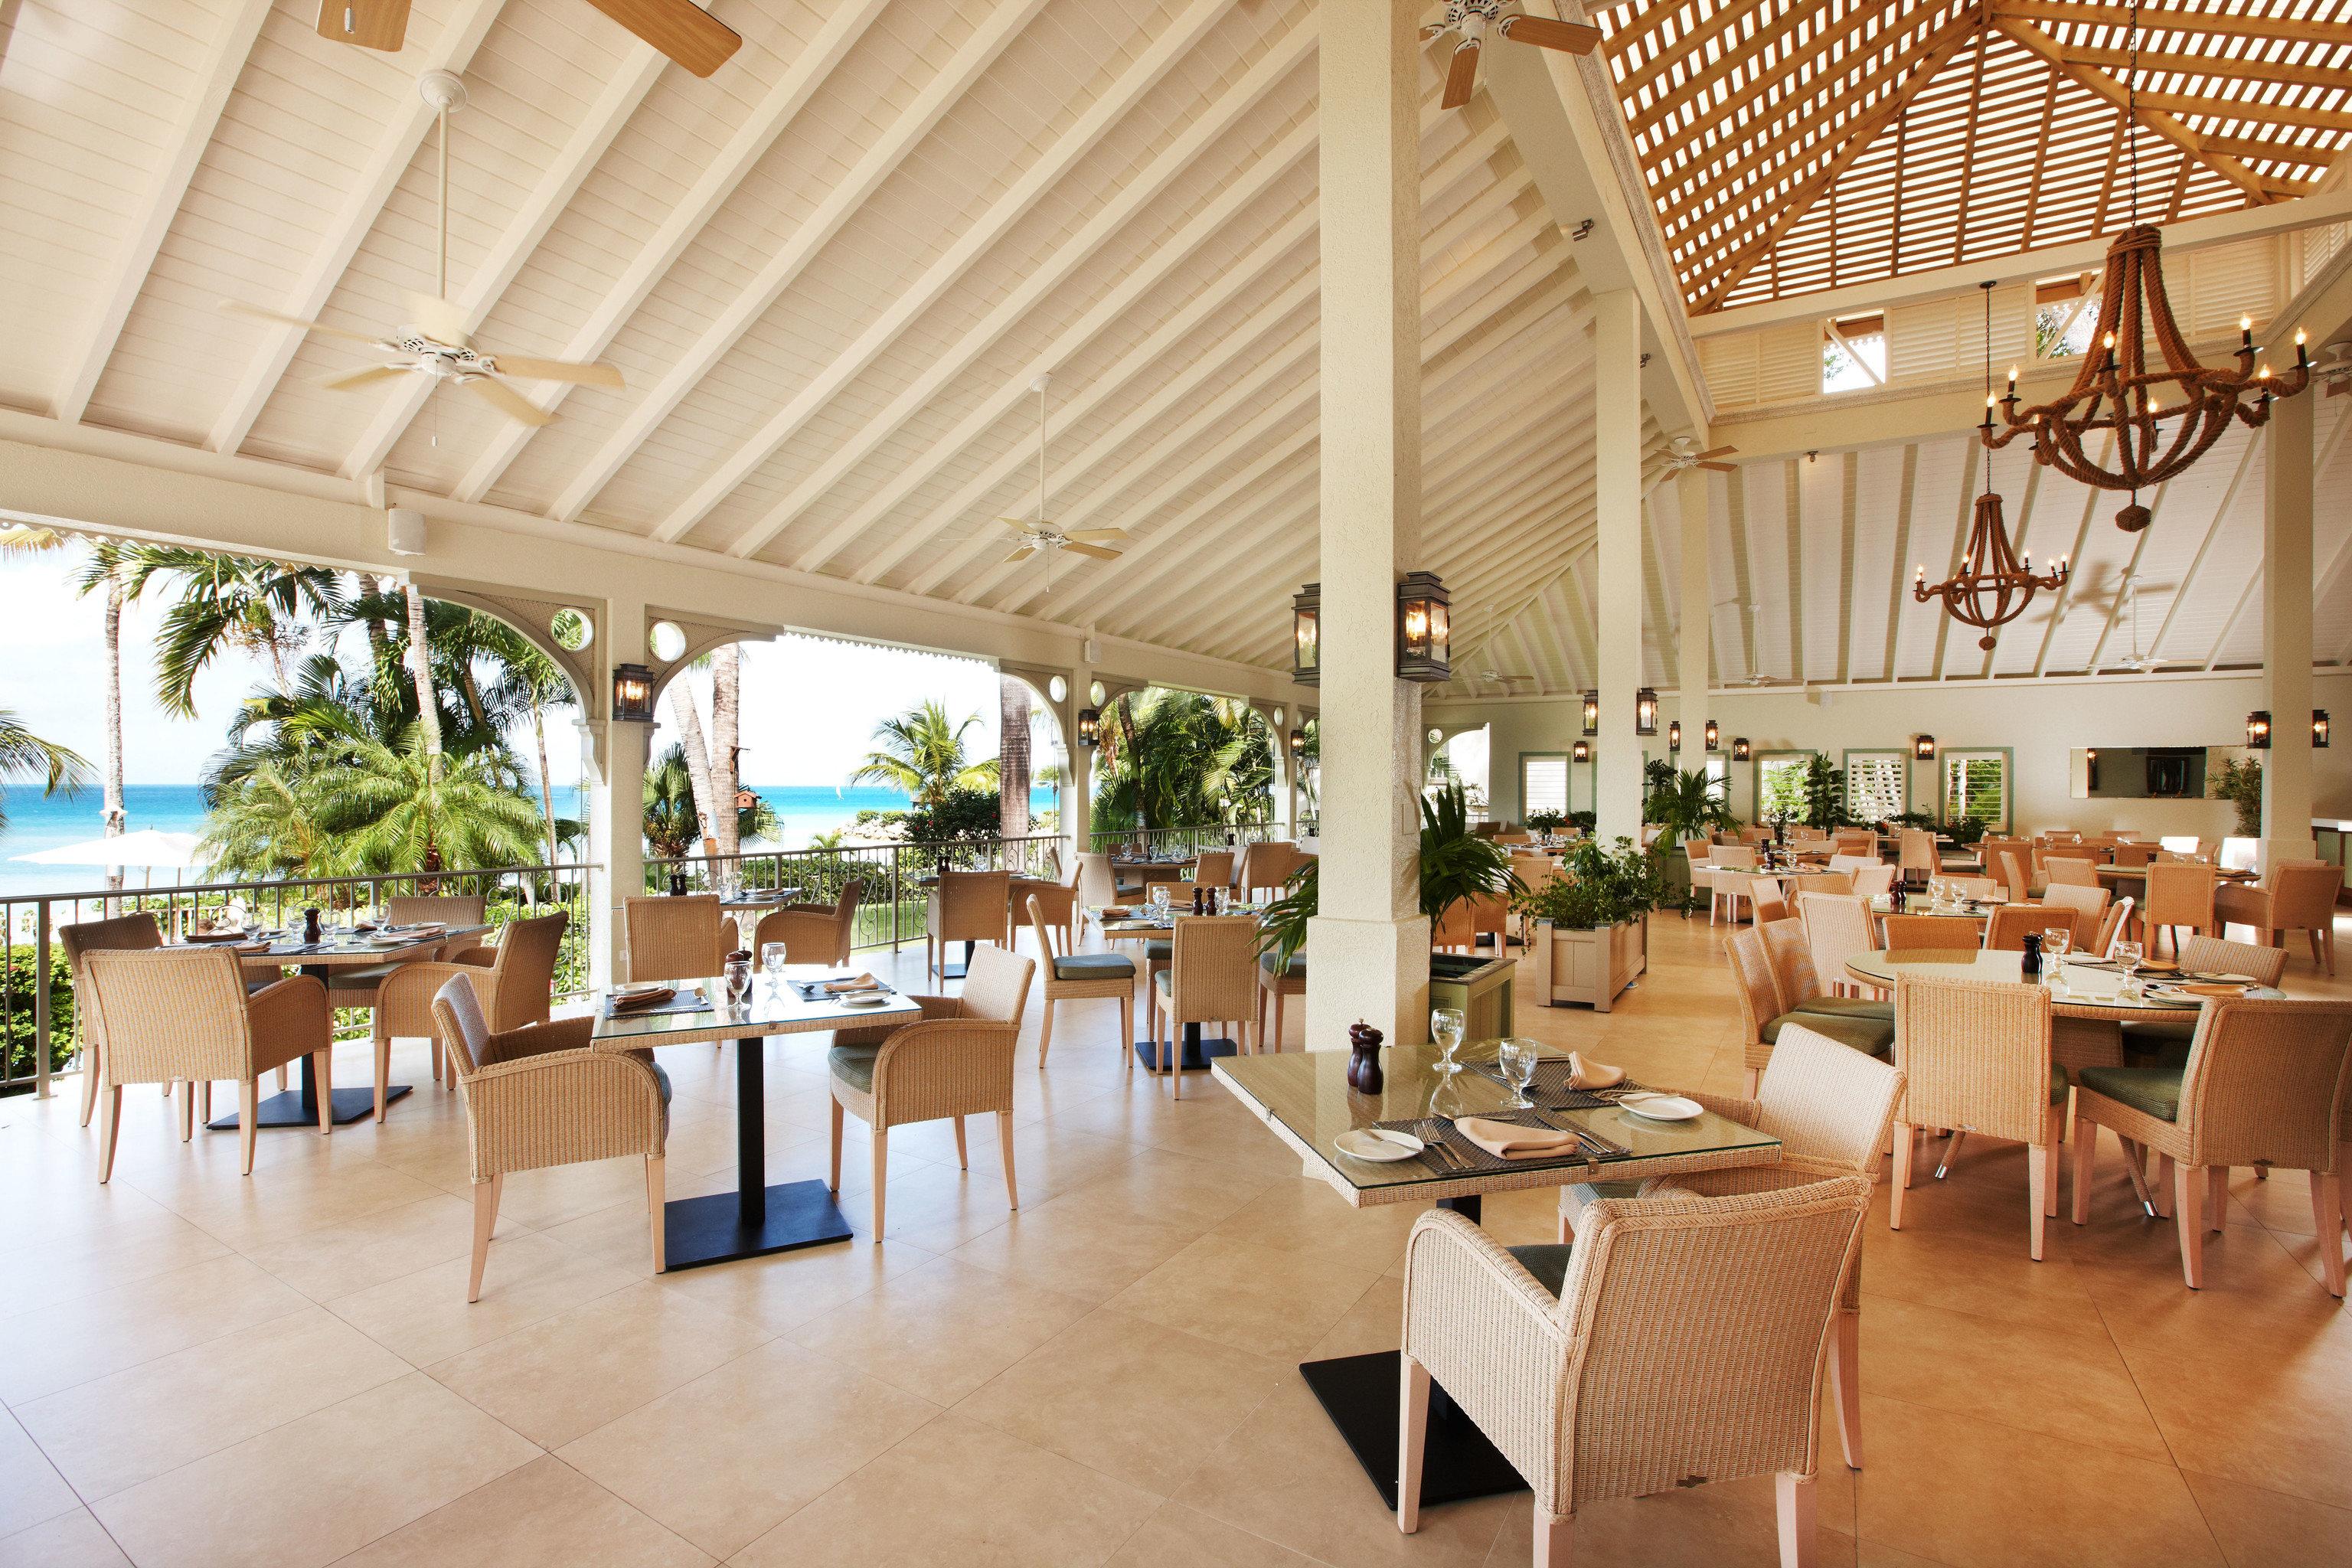 chair property Dining restaurant Resort function hall Villa